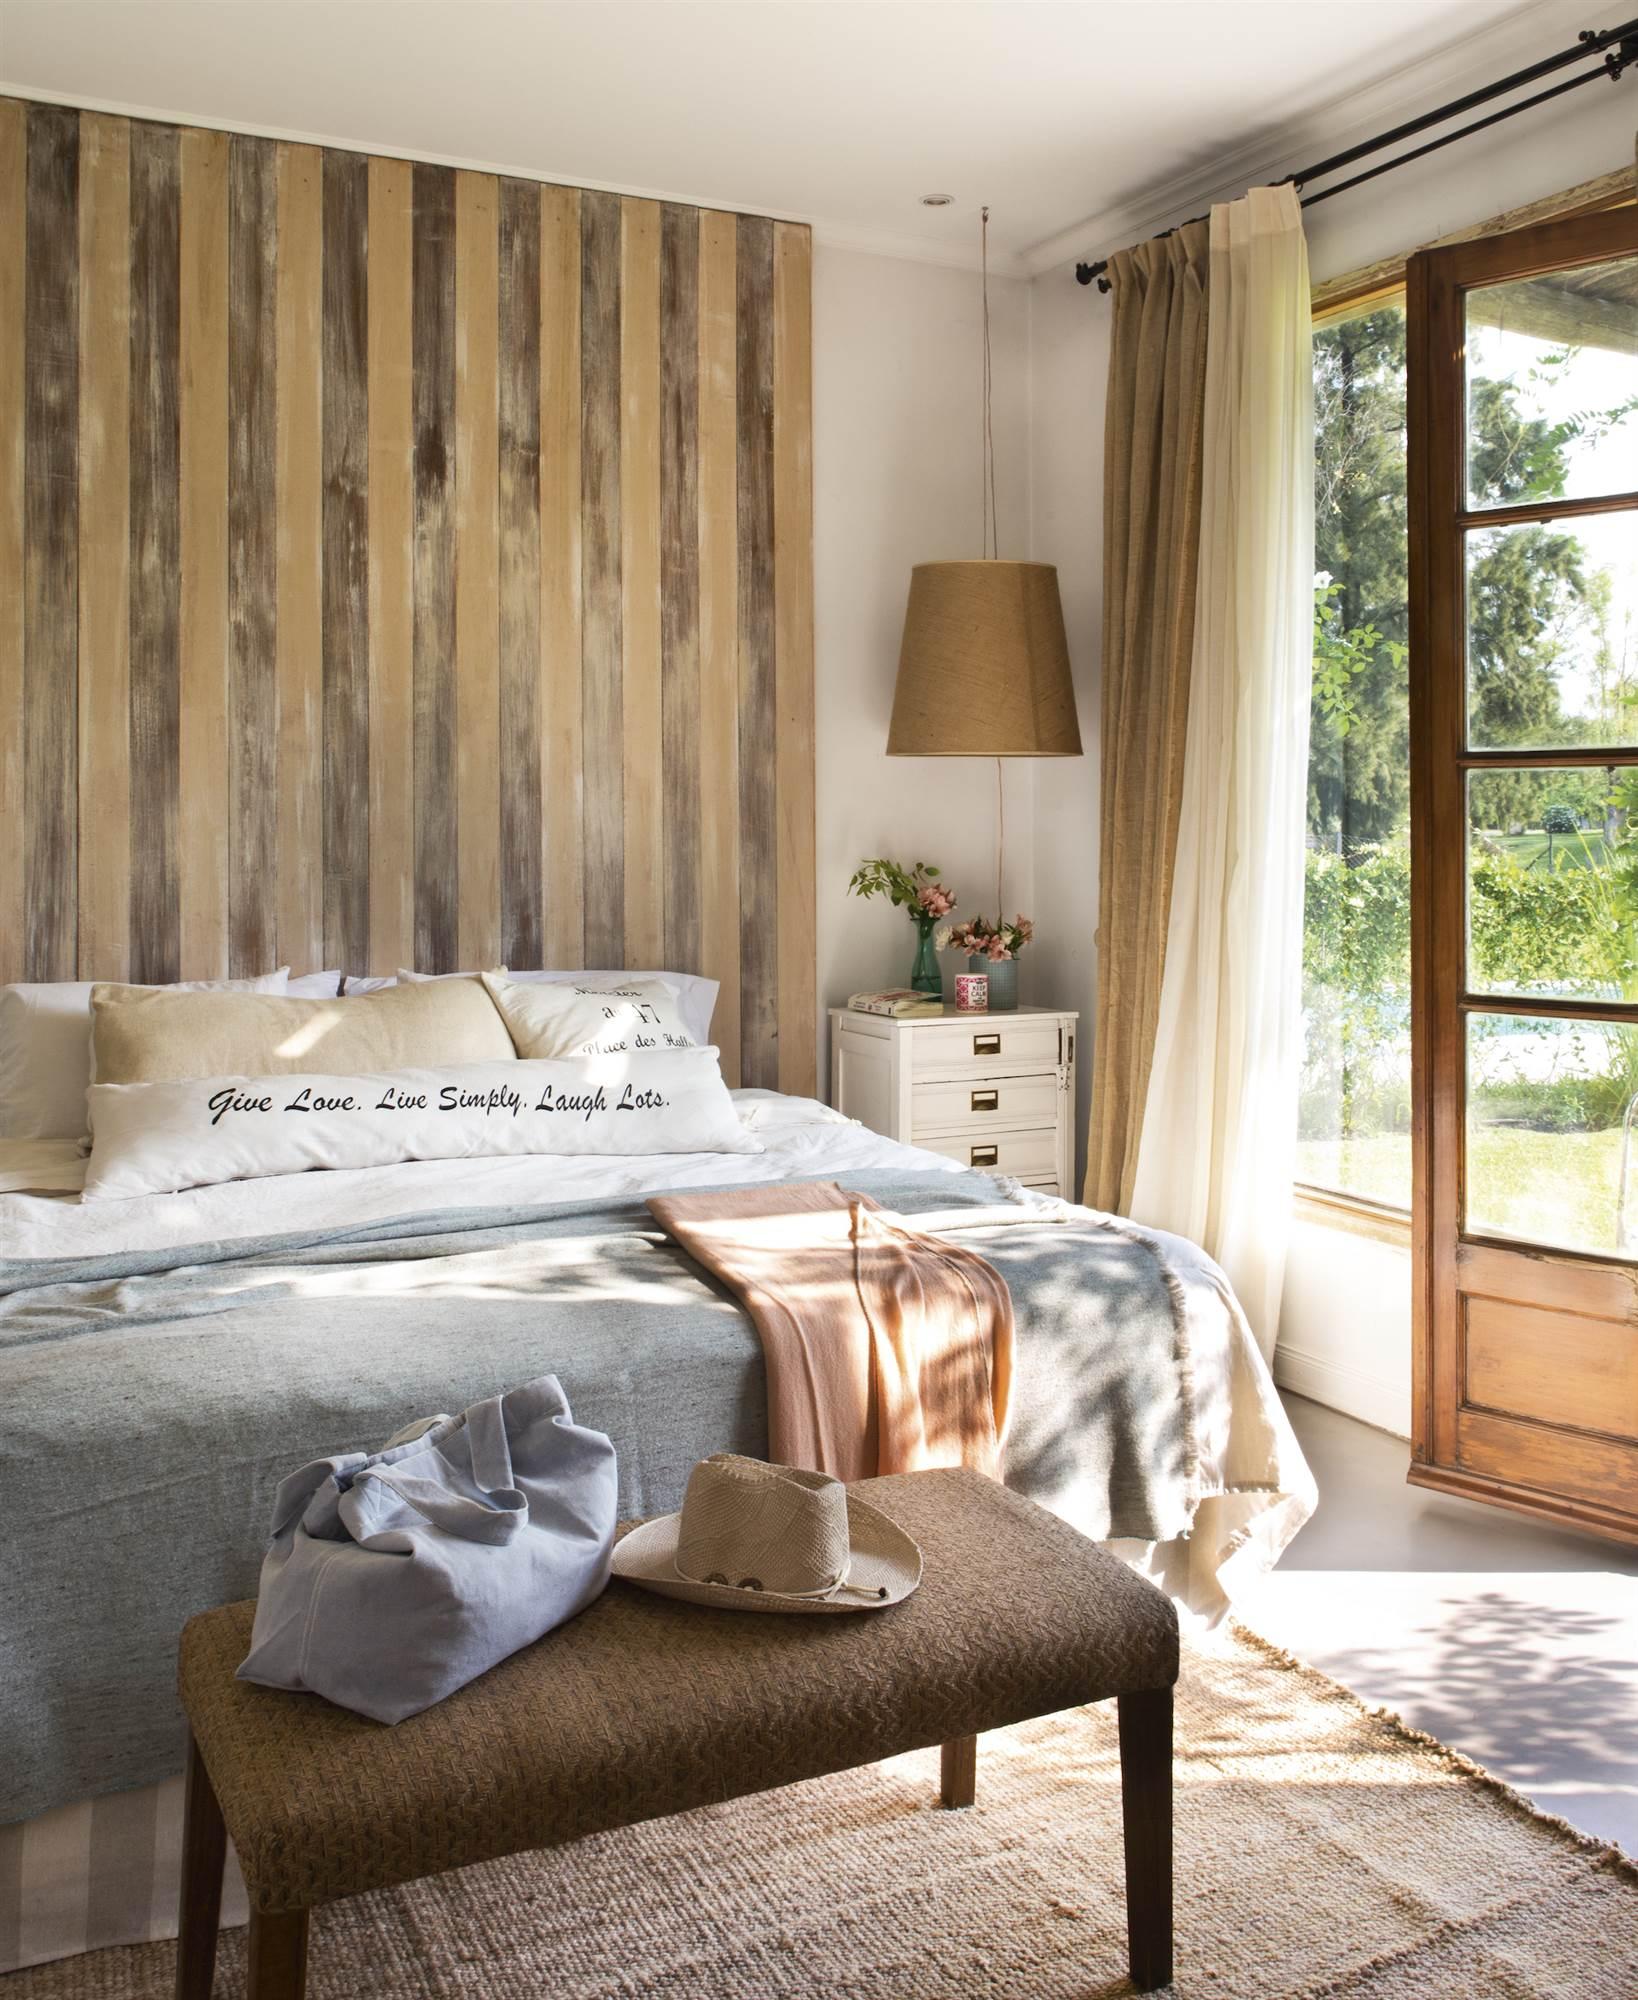 Cabeceros de cama originales - Cuadros como cabeceros de cama ...